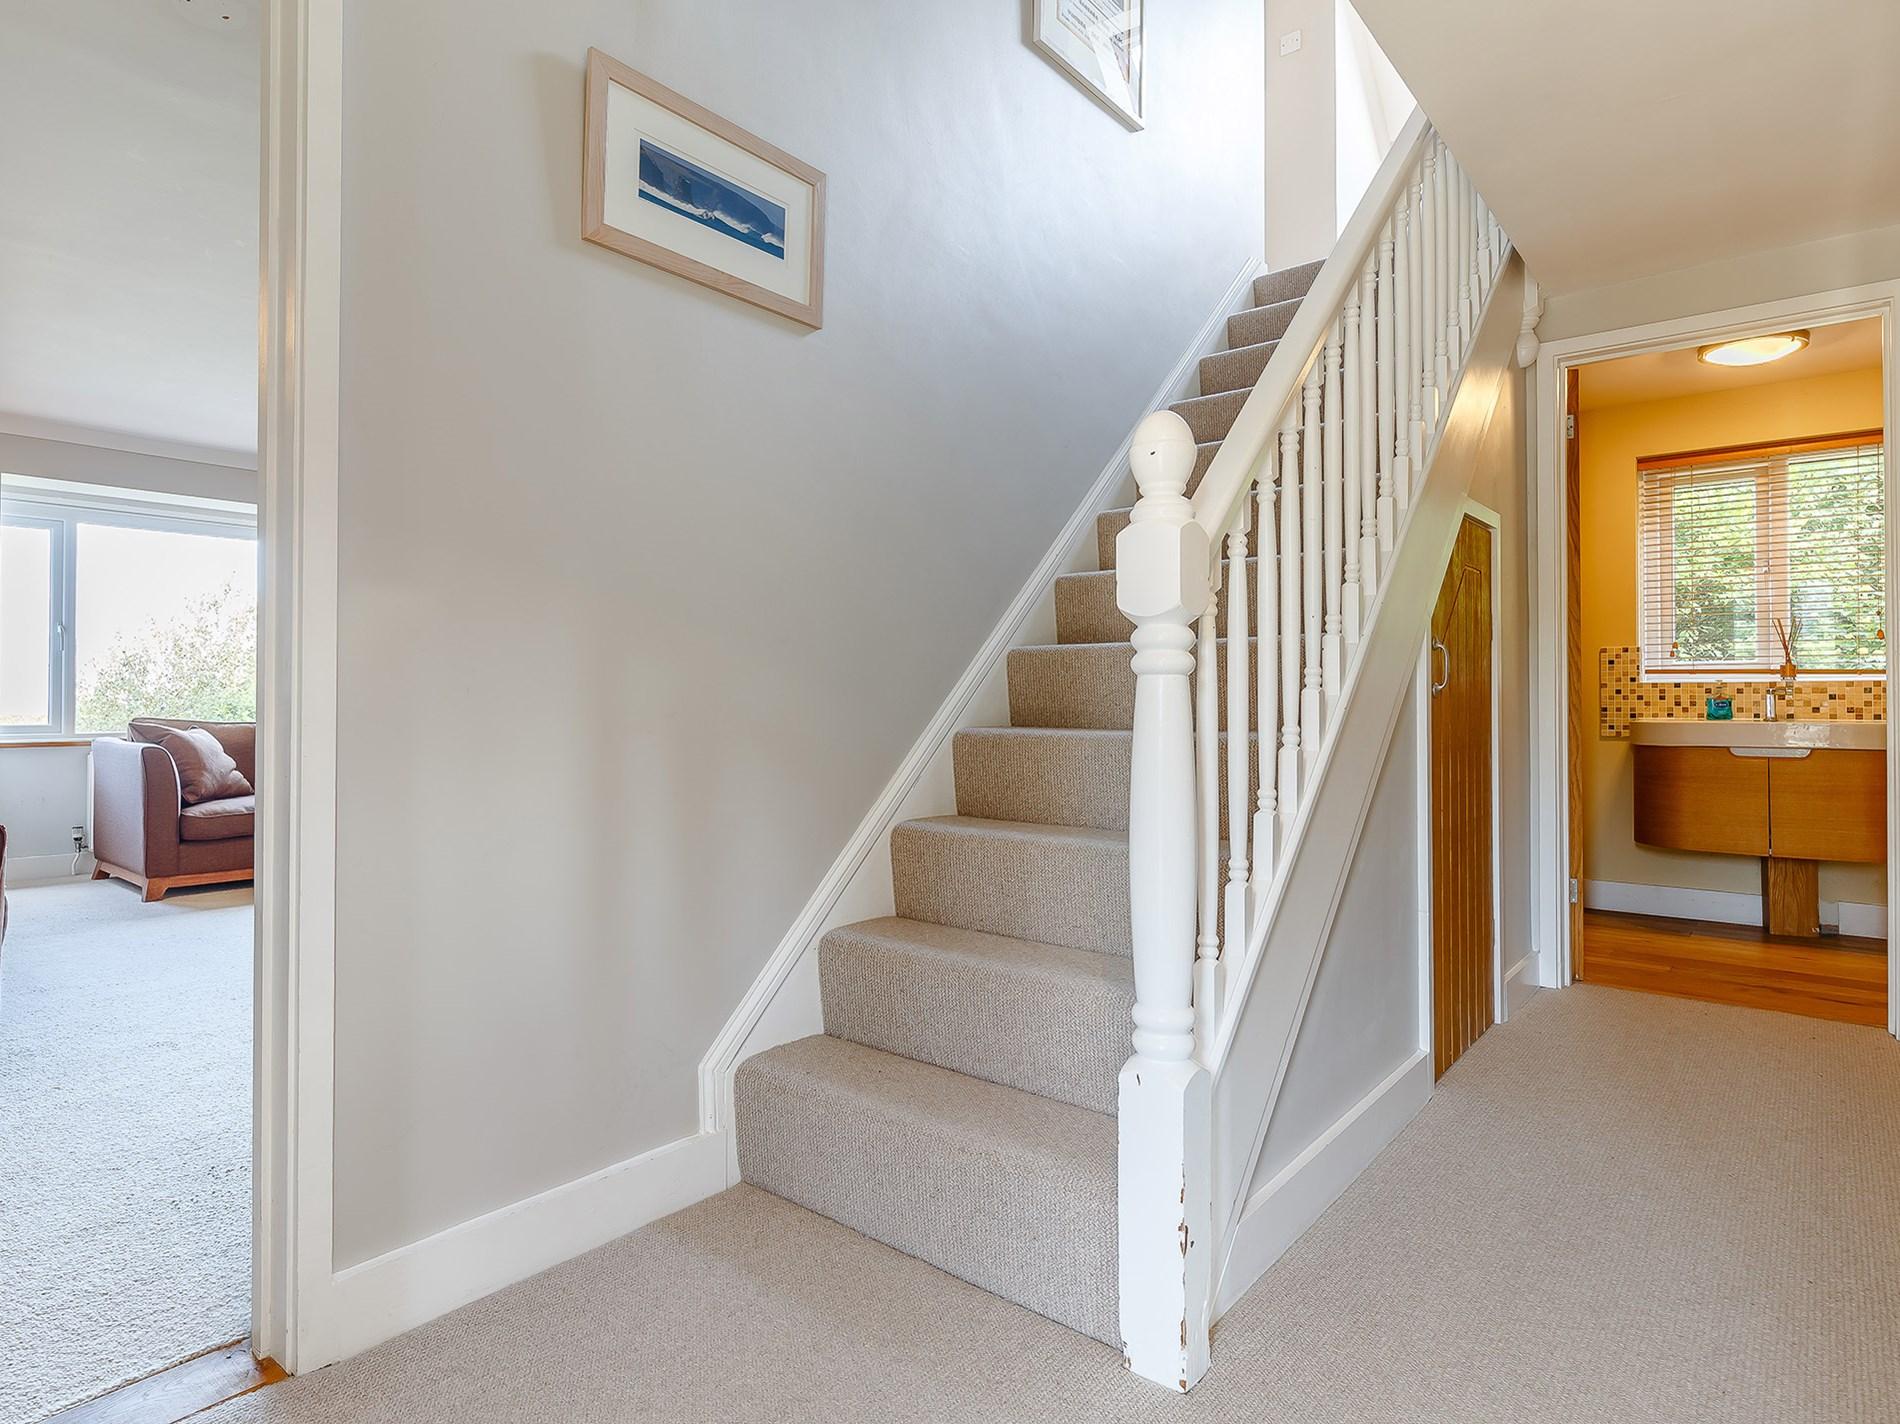 4 Bedroom House in North Cornwall, Cornwall